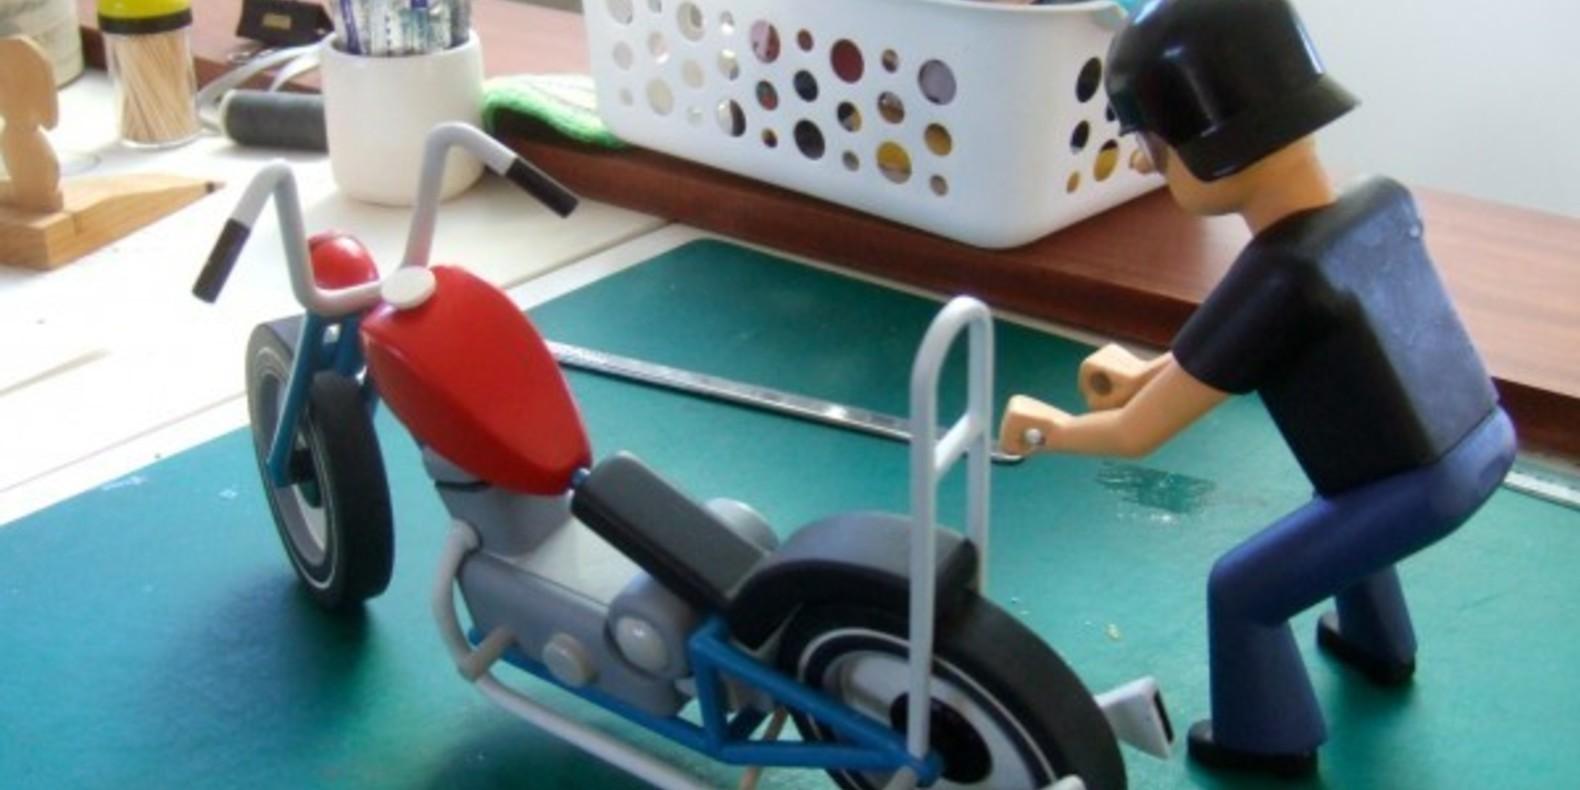 russell tate stay true motorcycle bike biker cults fichier 3D modèle 3D STL 3D printing 5